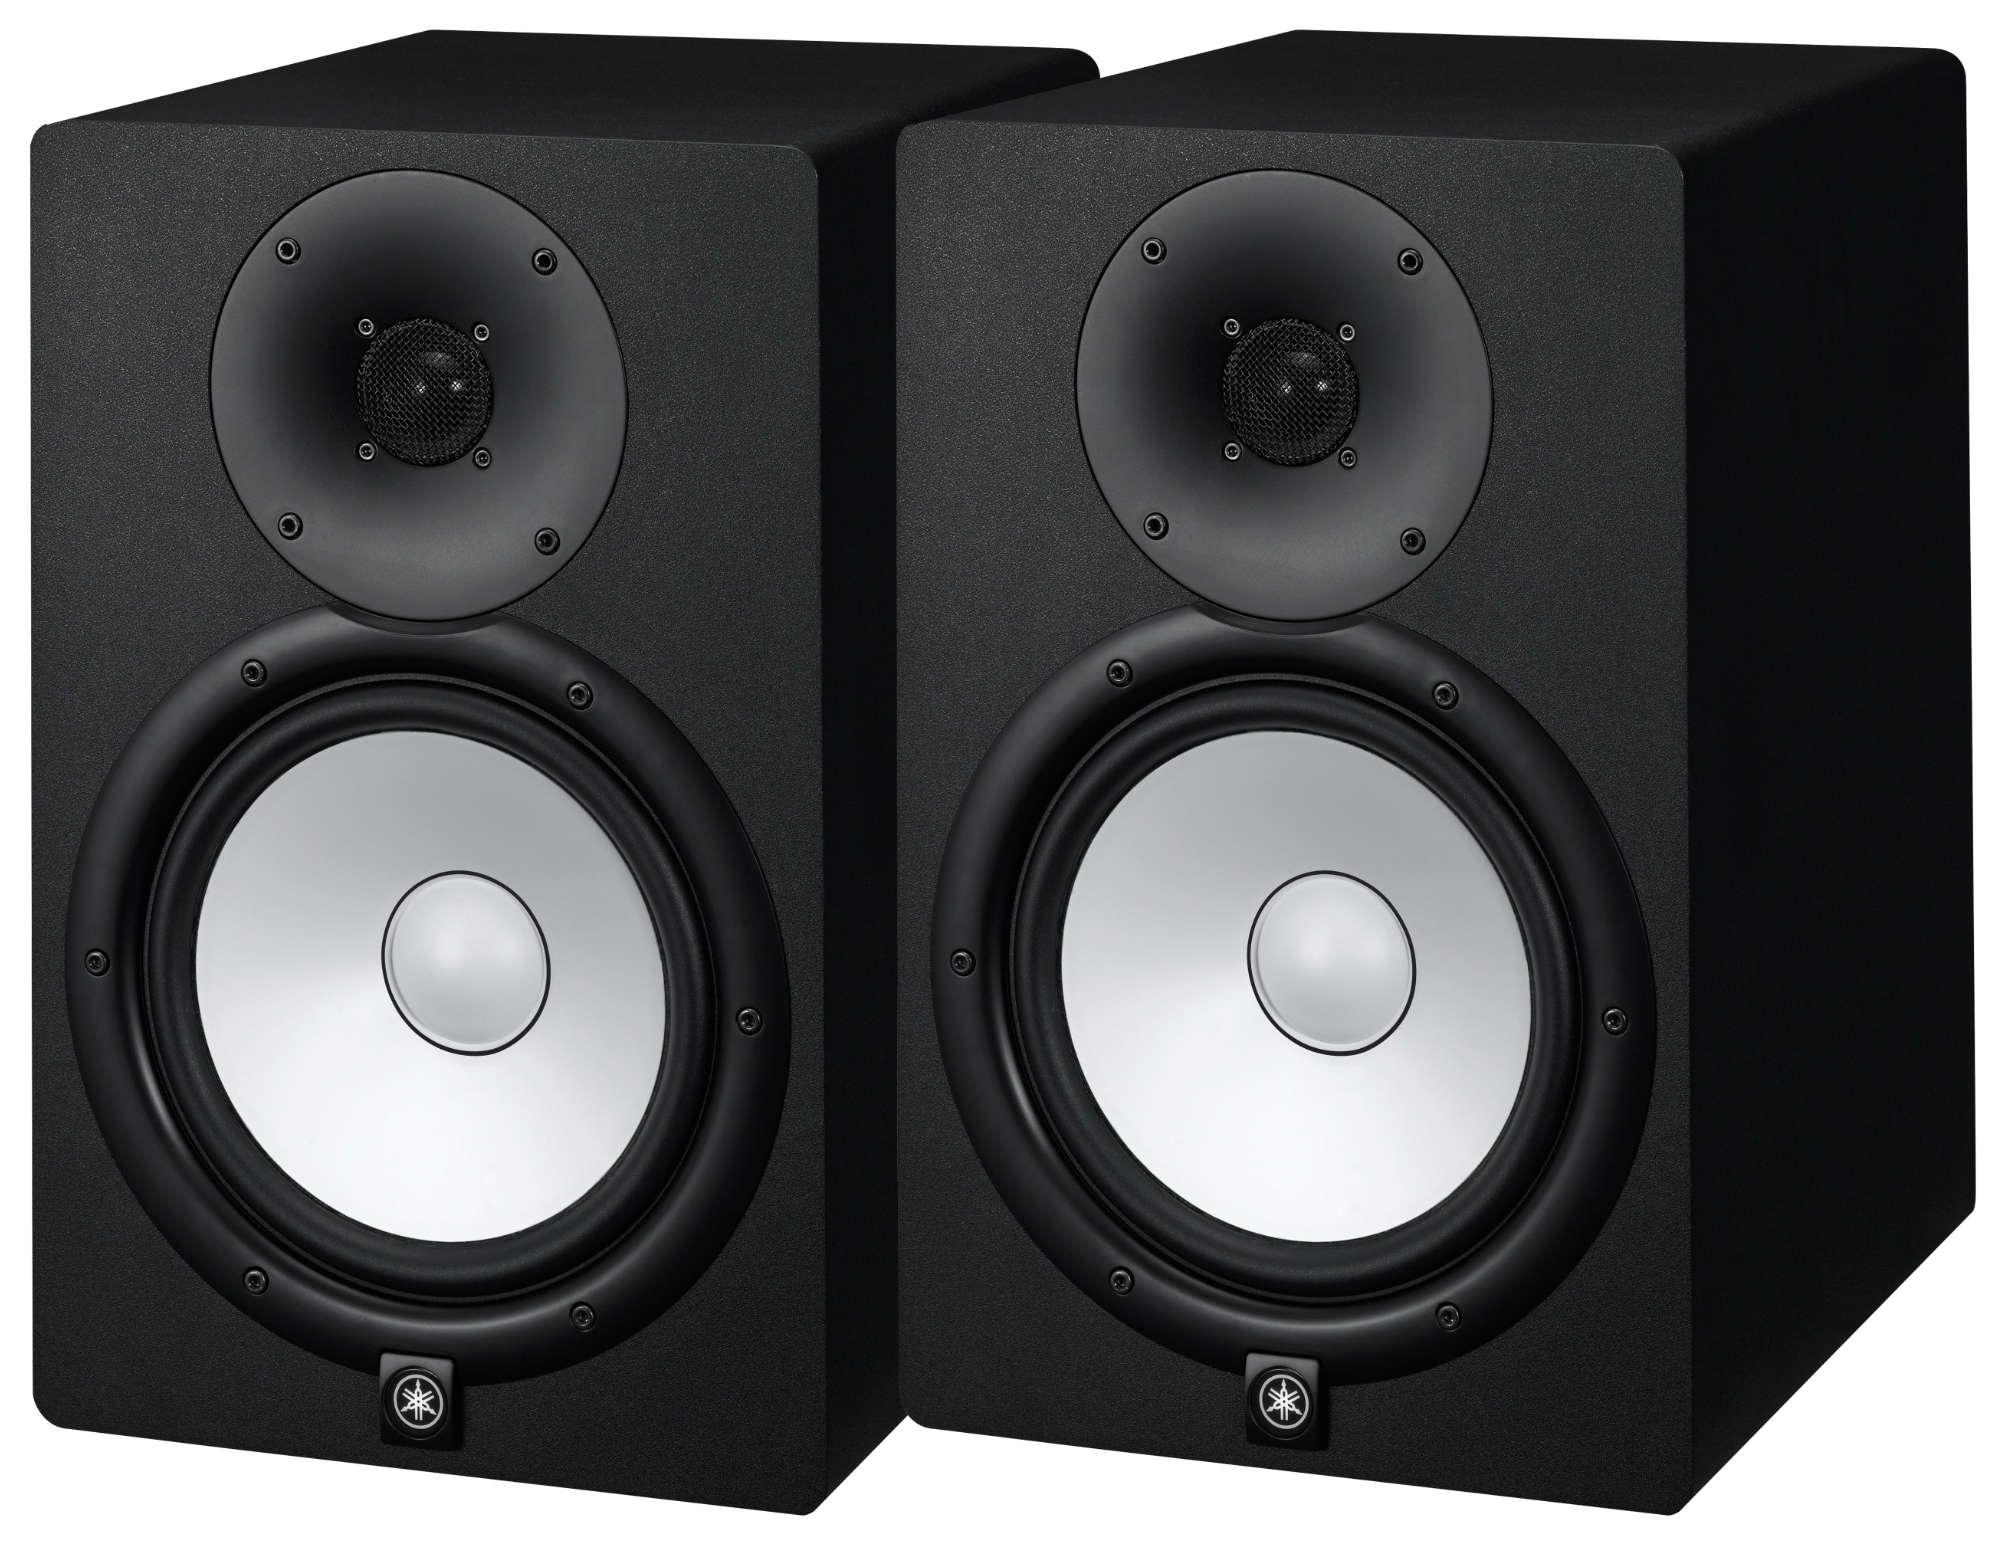 Studiomonitore - Yamaha HS8 MP - Onlineshop Musikhaus Kirstein